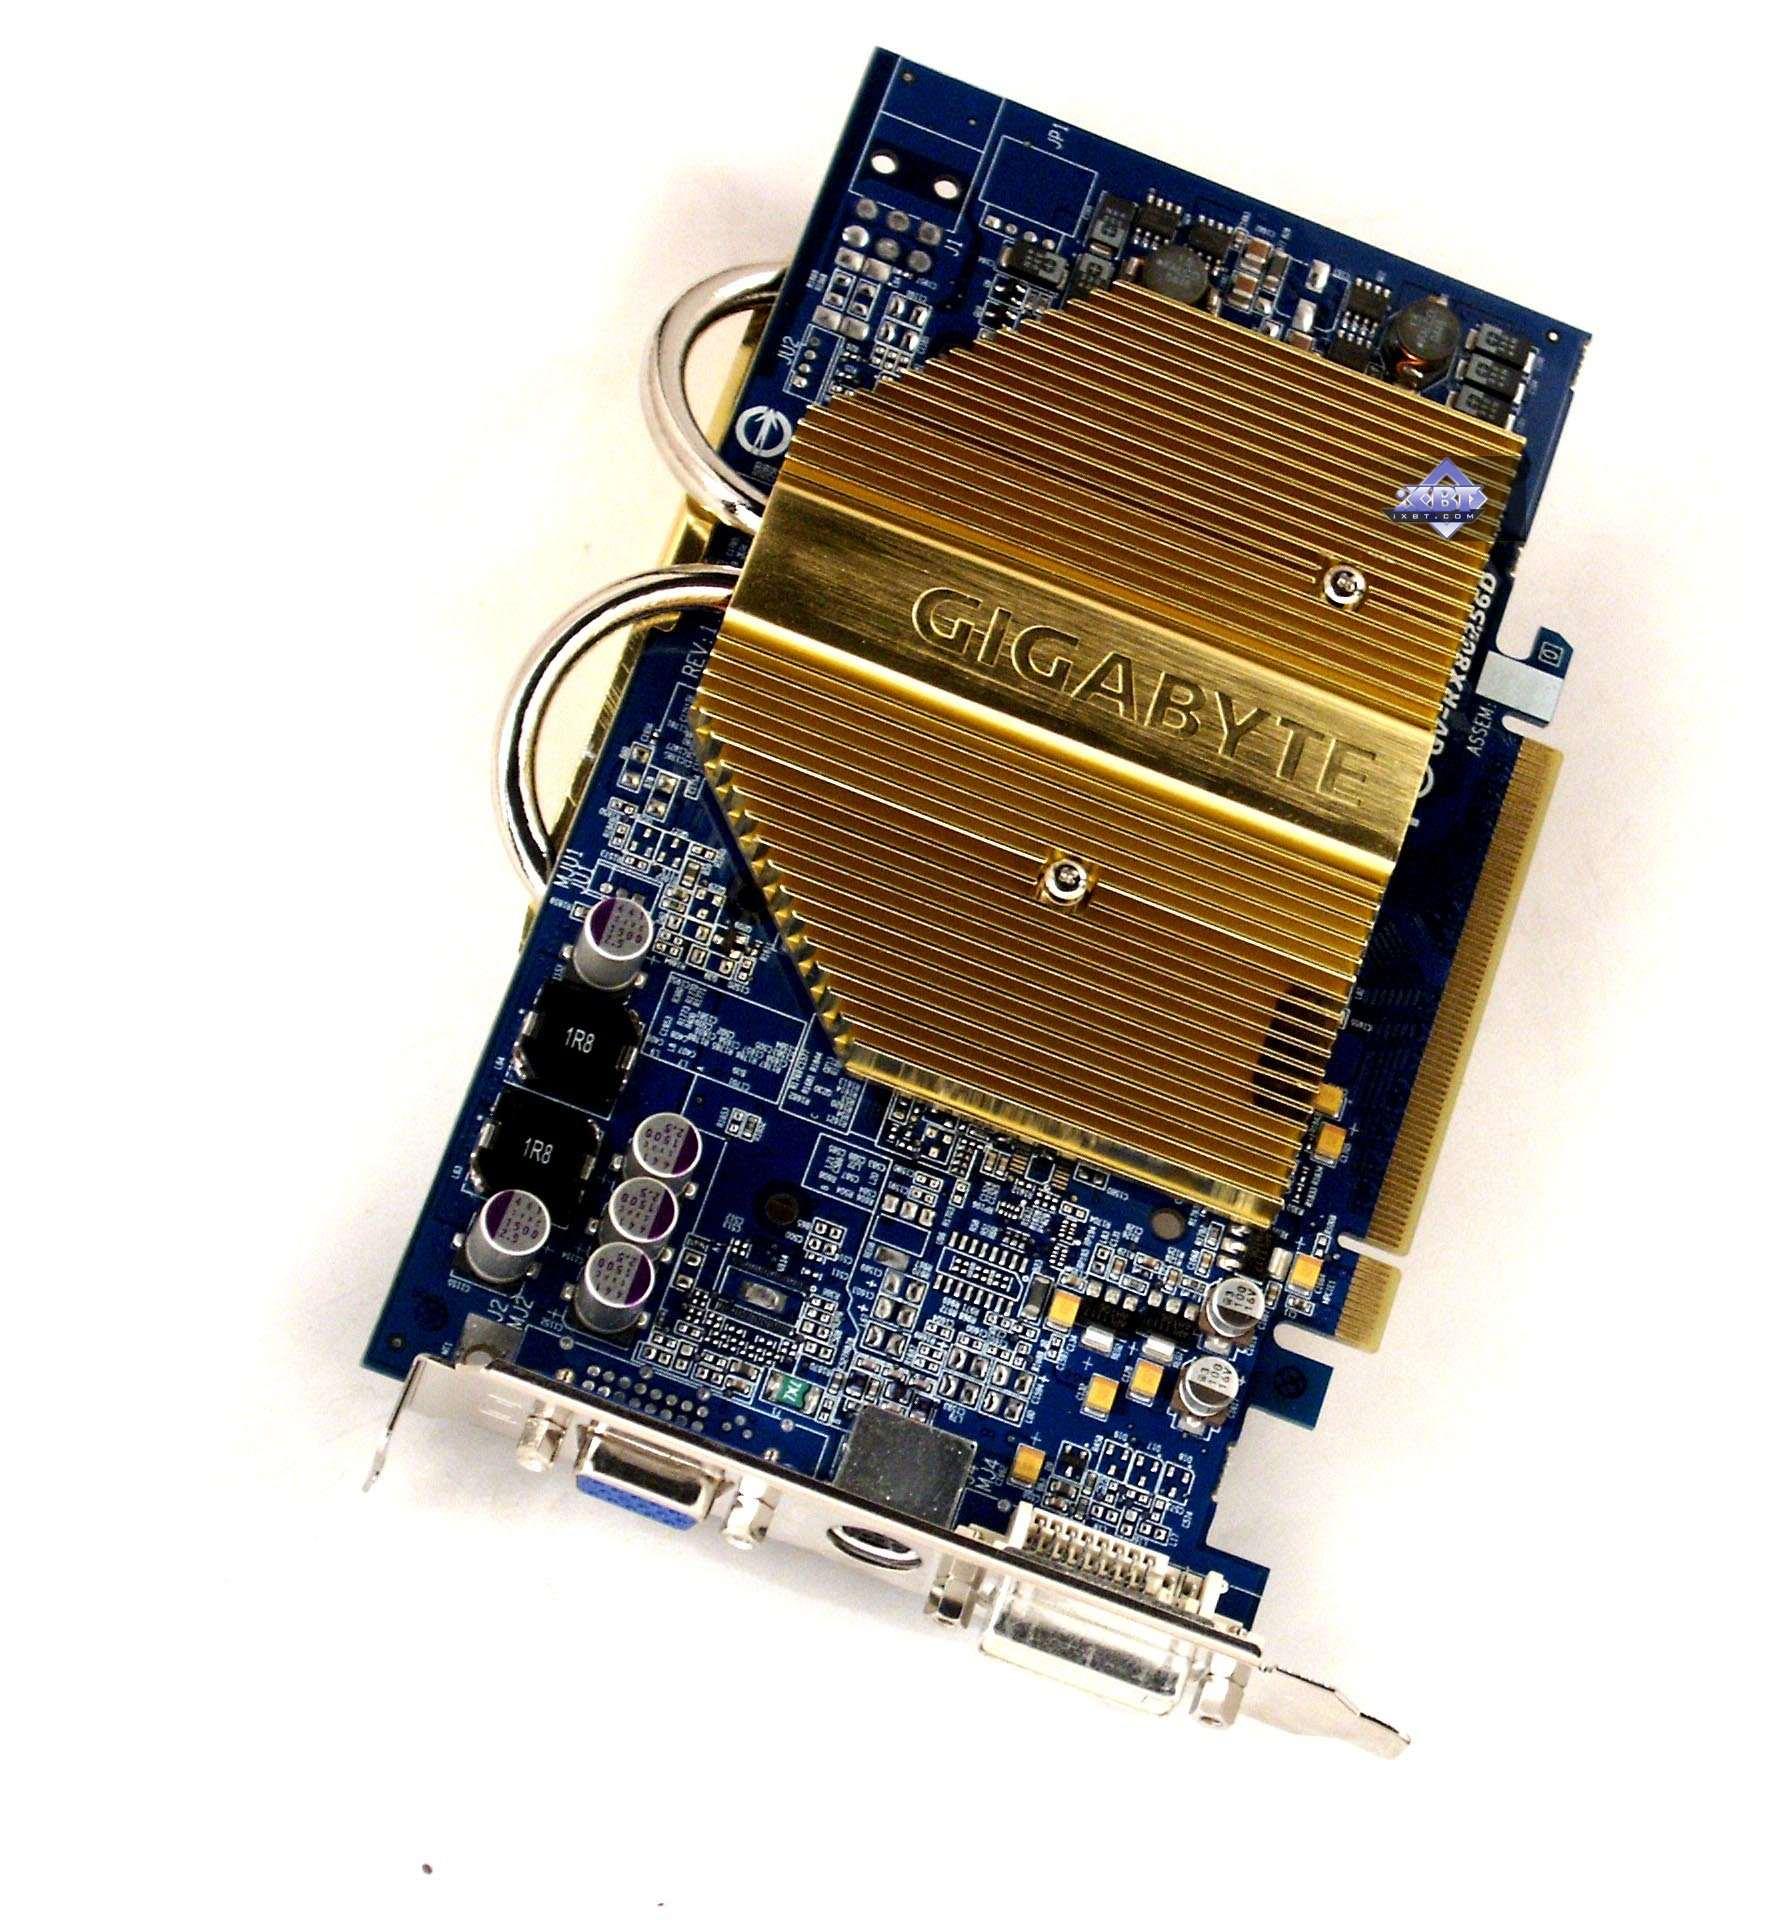 Драйвер Gigabyte Radeon 9250 128Mb